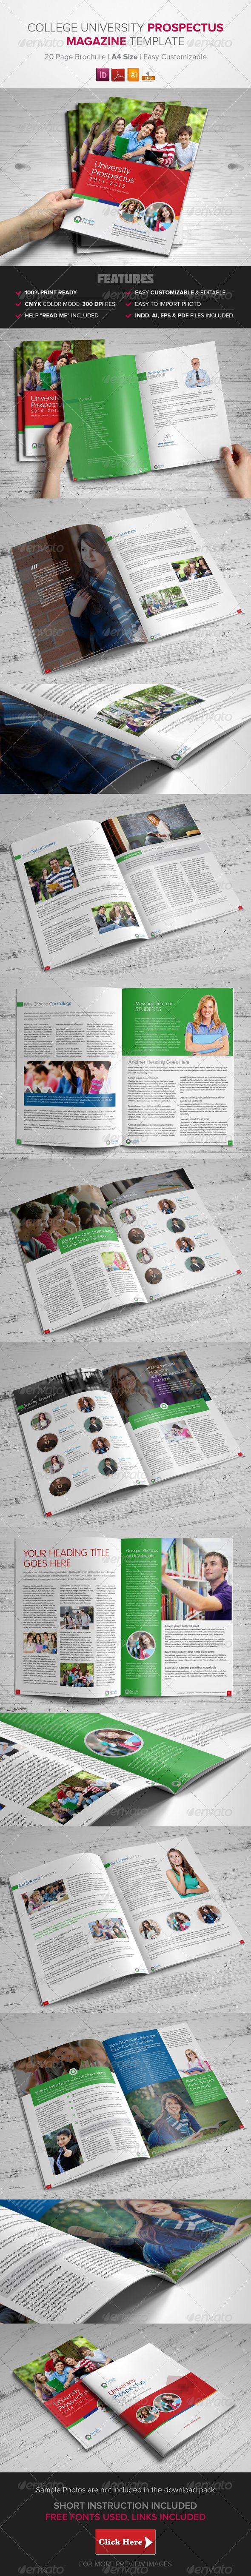 College University Prospectus/ Magazine Template